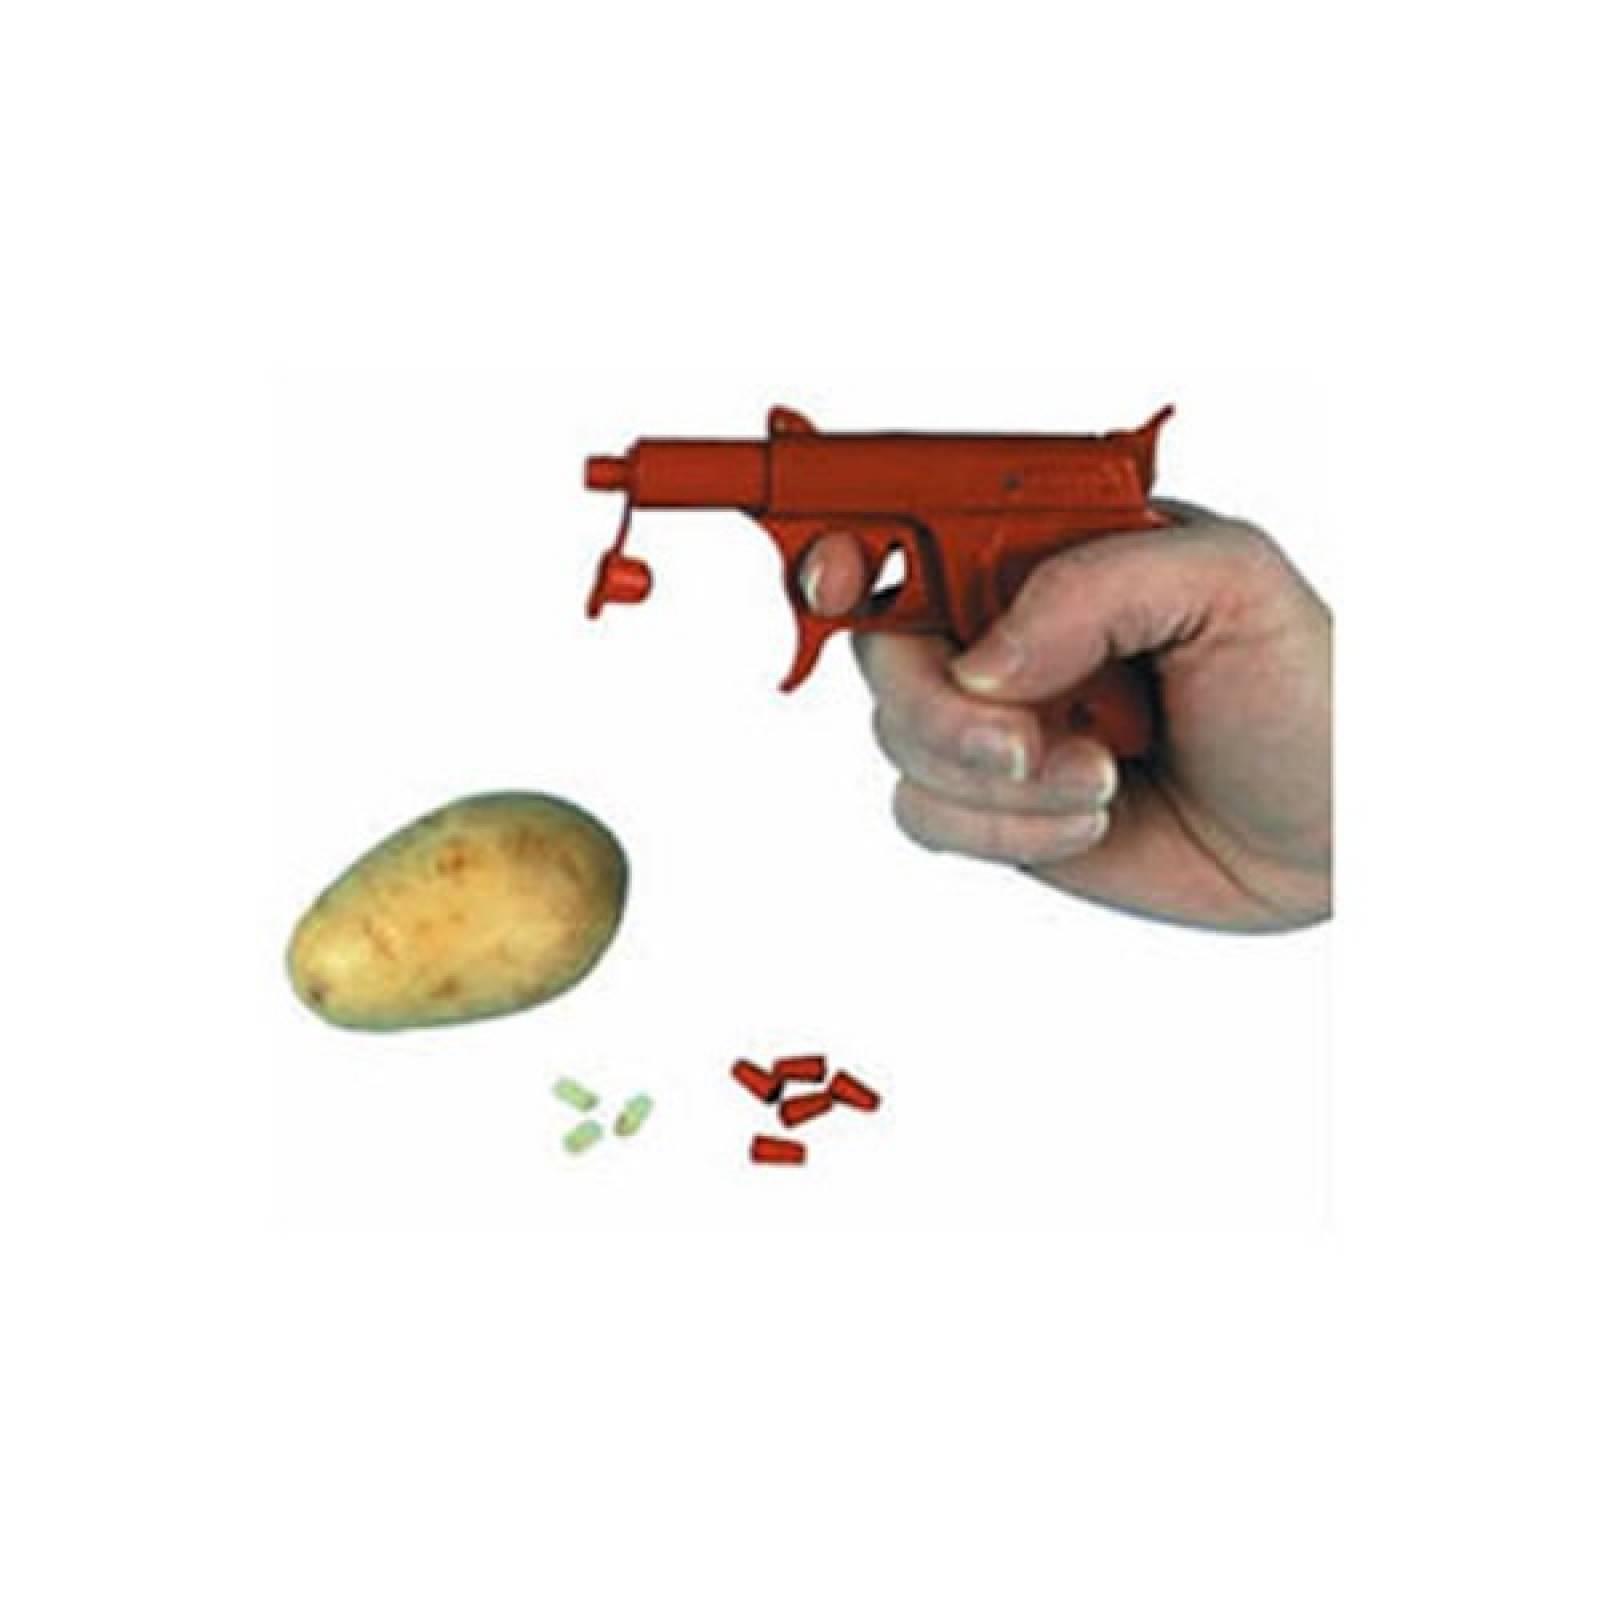 Spud Gun - Fires, Potato, Water and Pellets. thumbnails